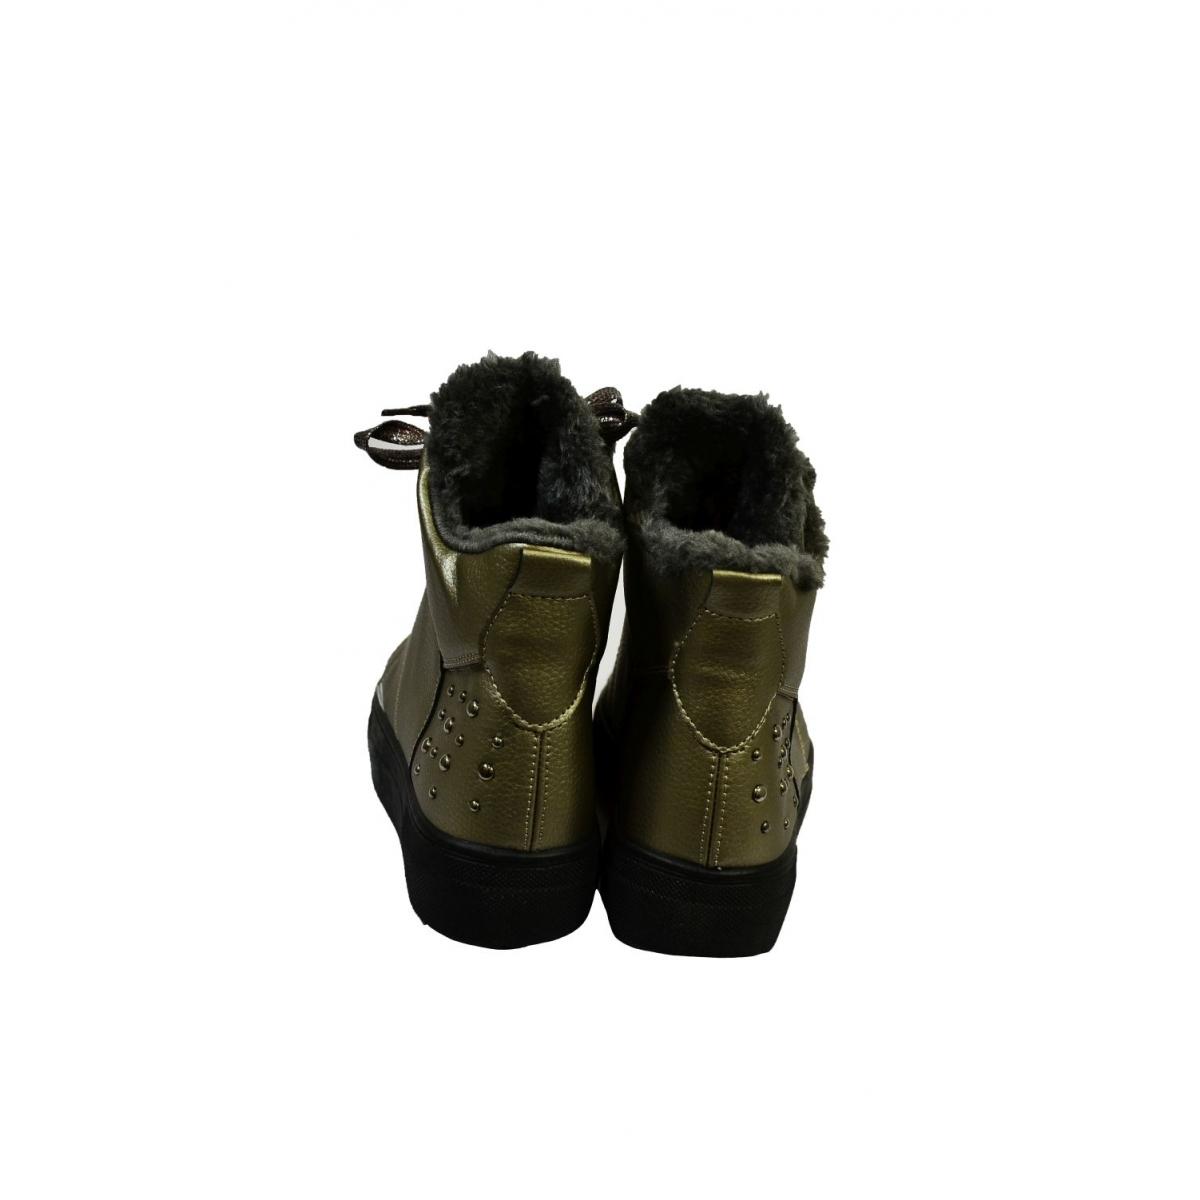 Dámske topánky SARAAH - 4 1e251cffba3